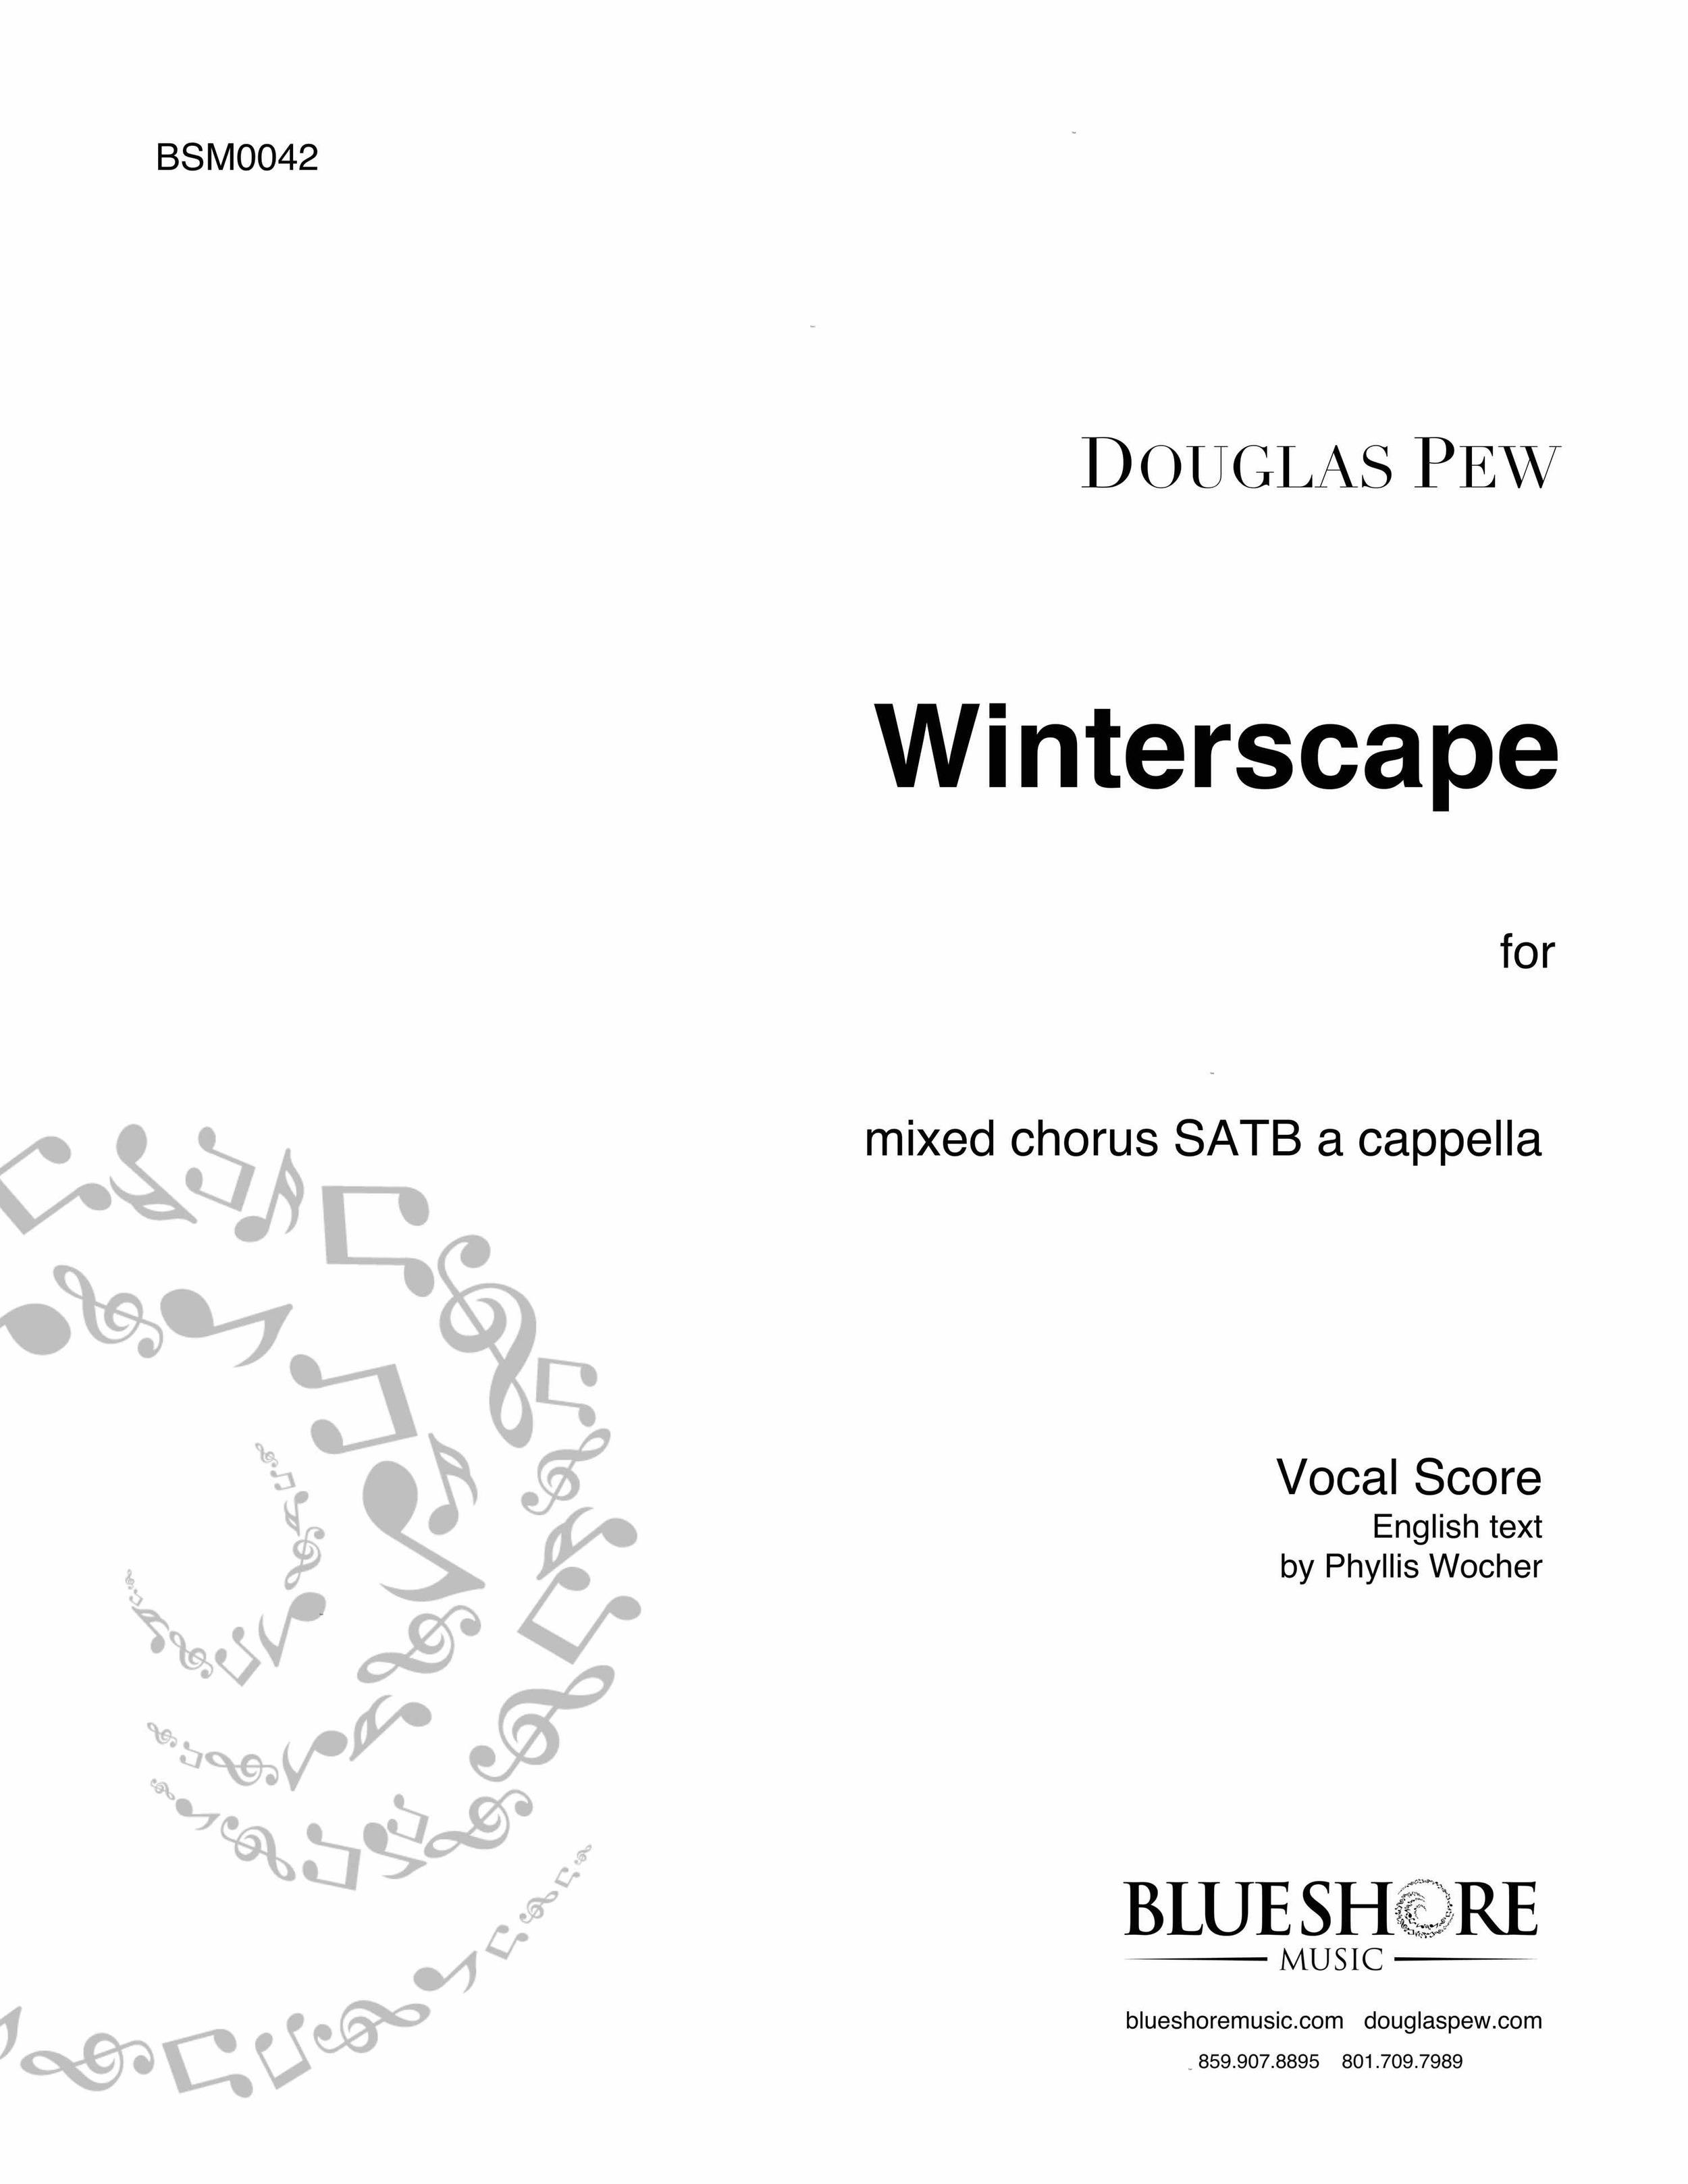 Pew_BSM0042_Winterscape_SATB_cover_smaller.jpg